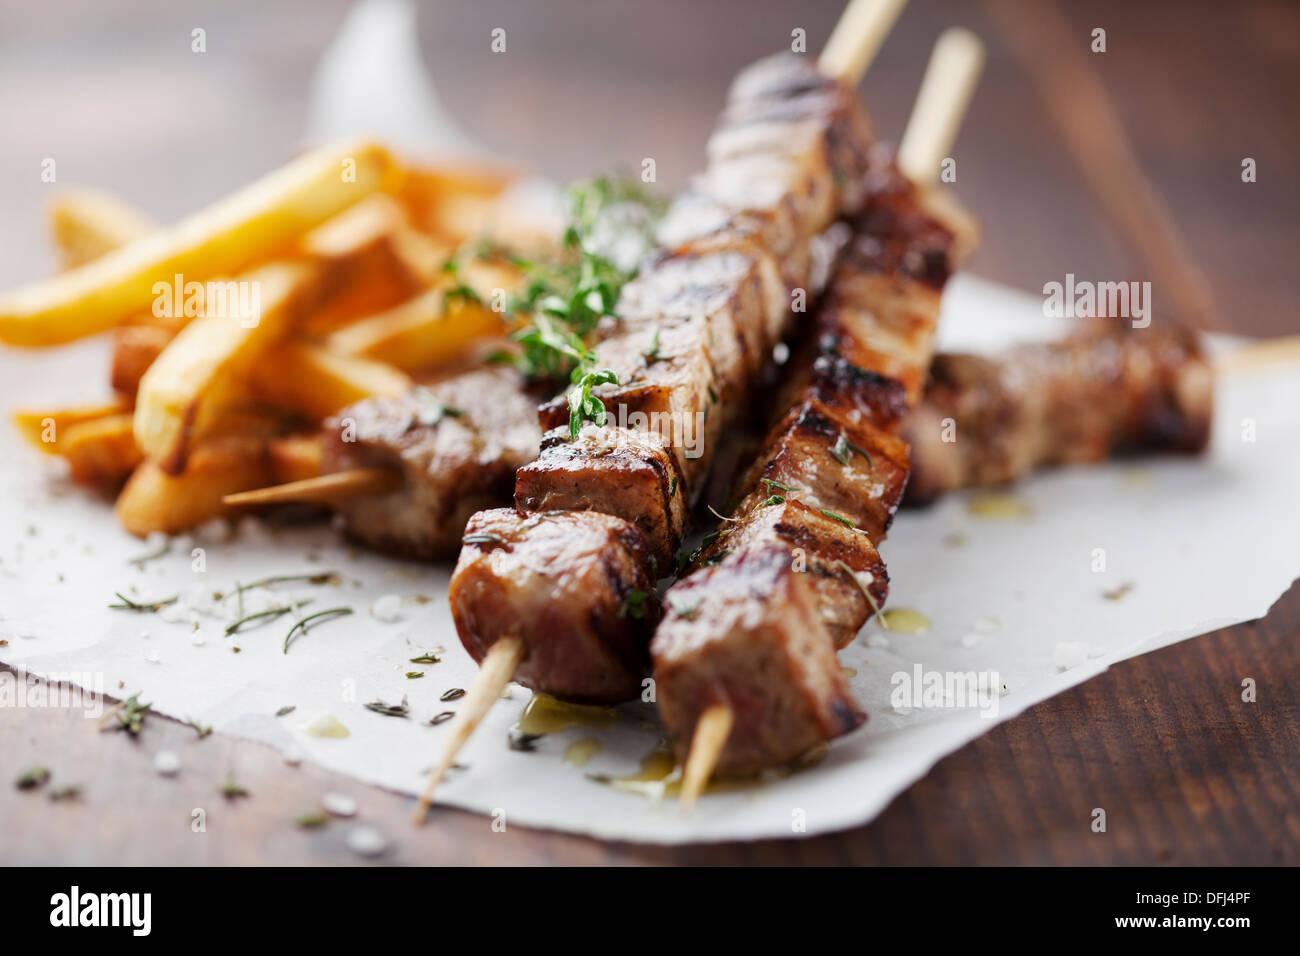 grilled meat, souvlaki - Stock Image